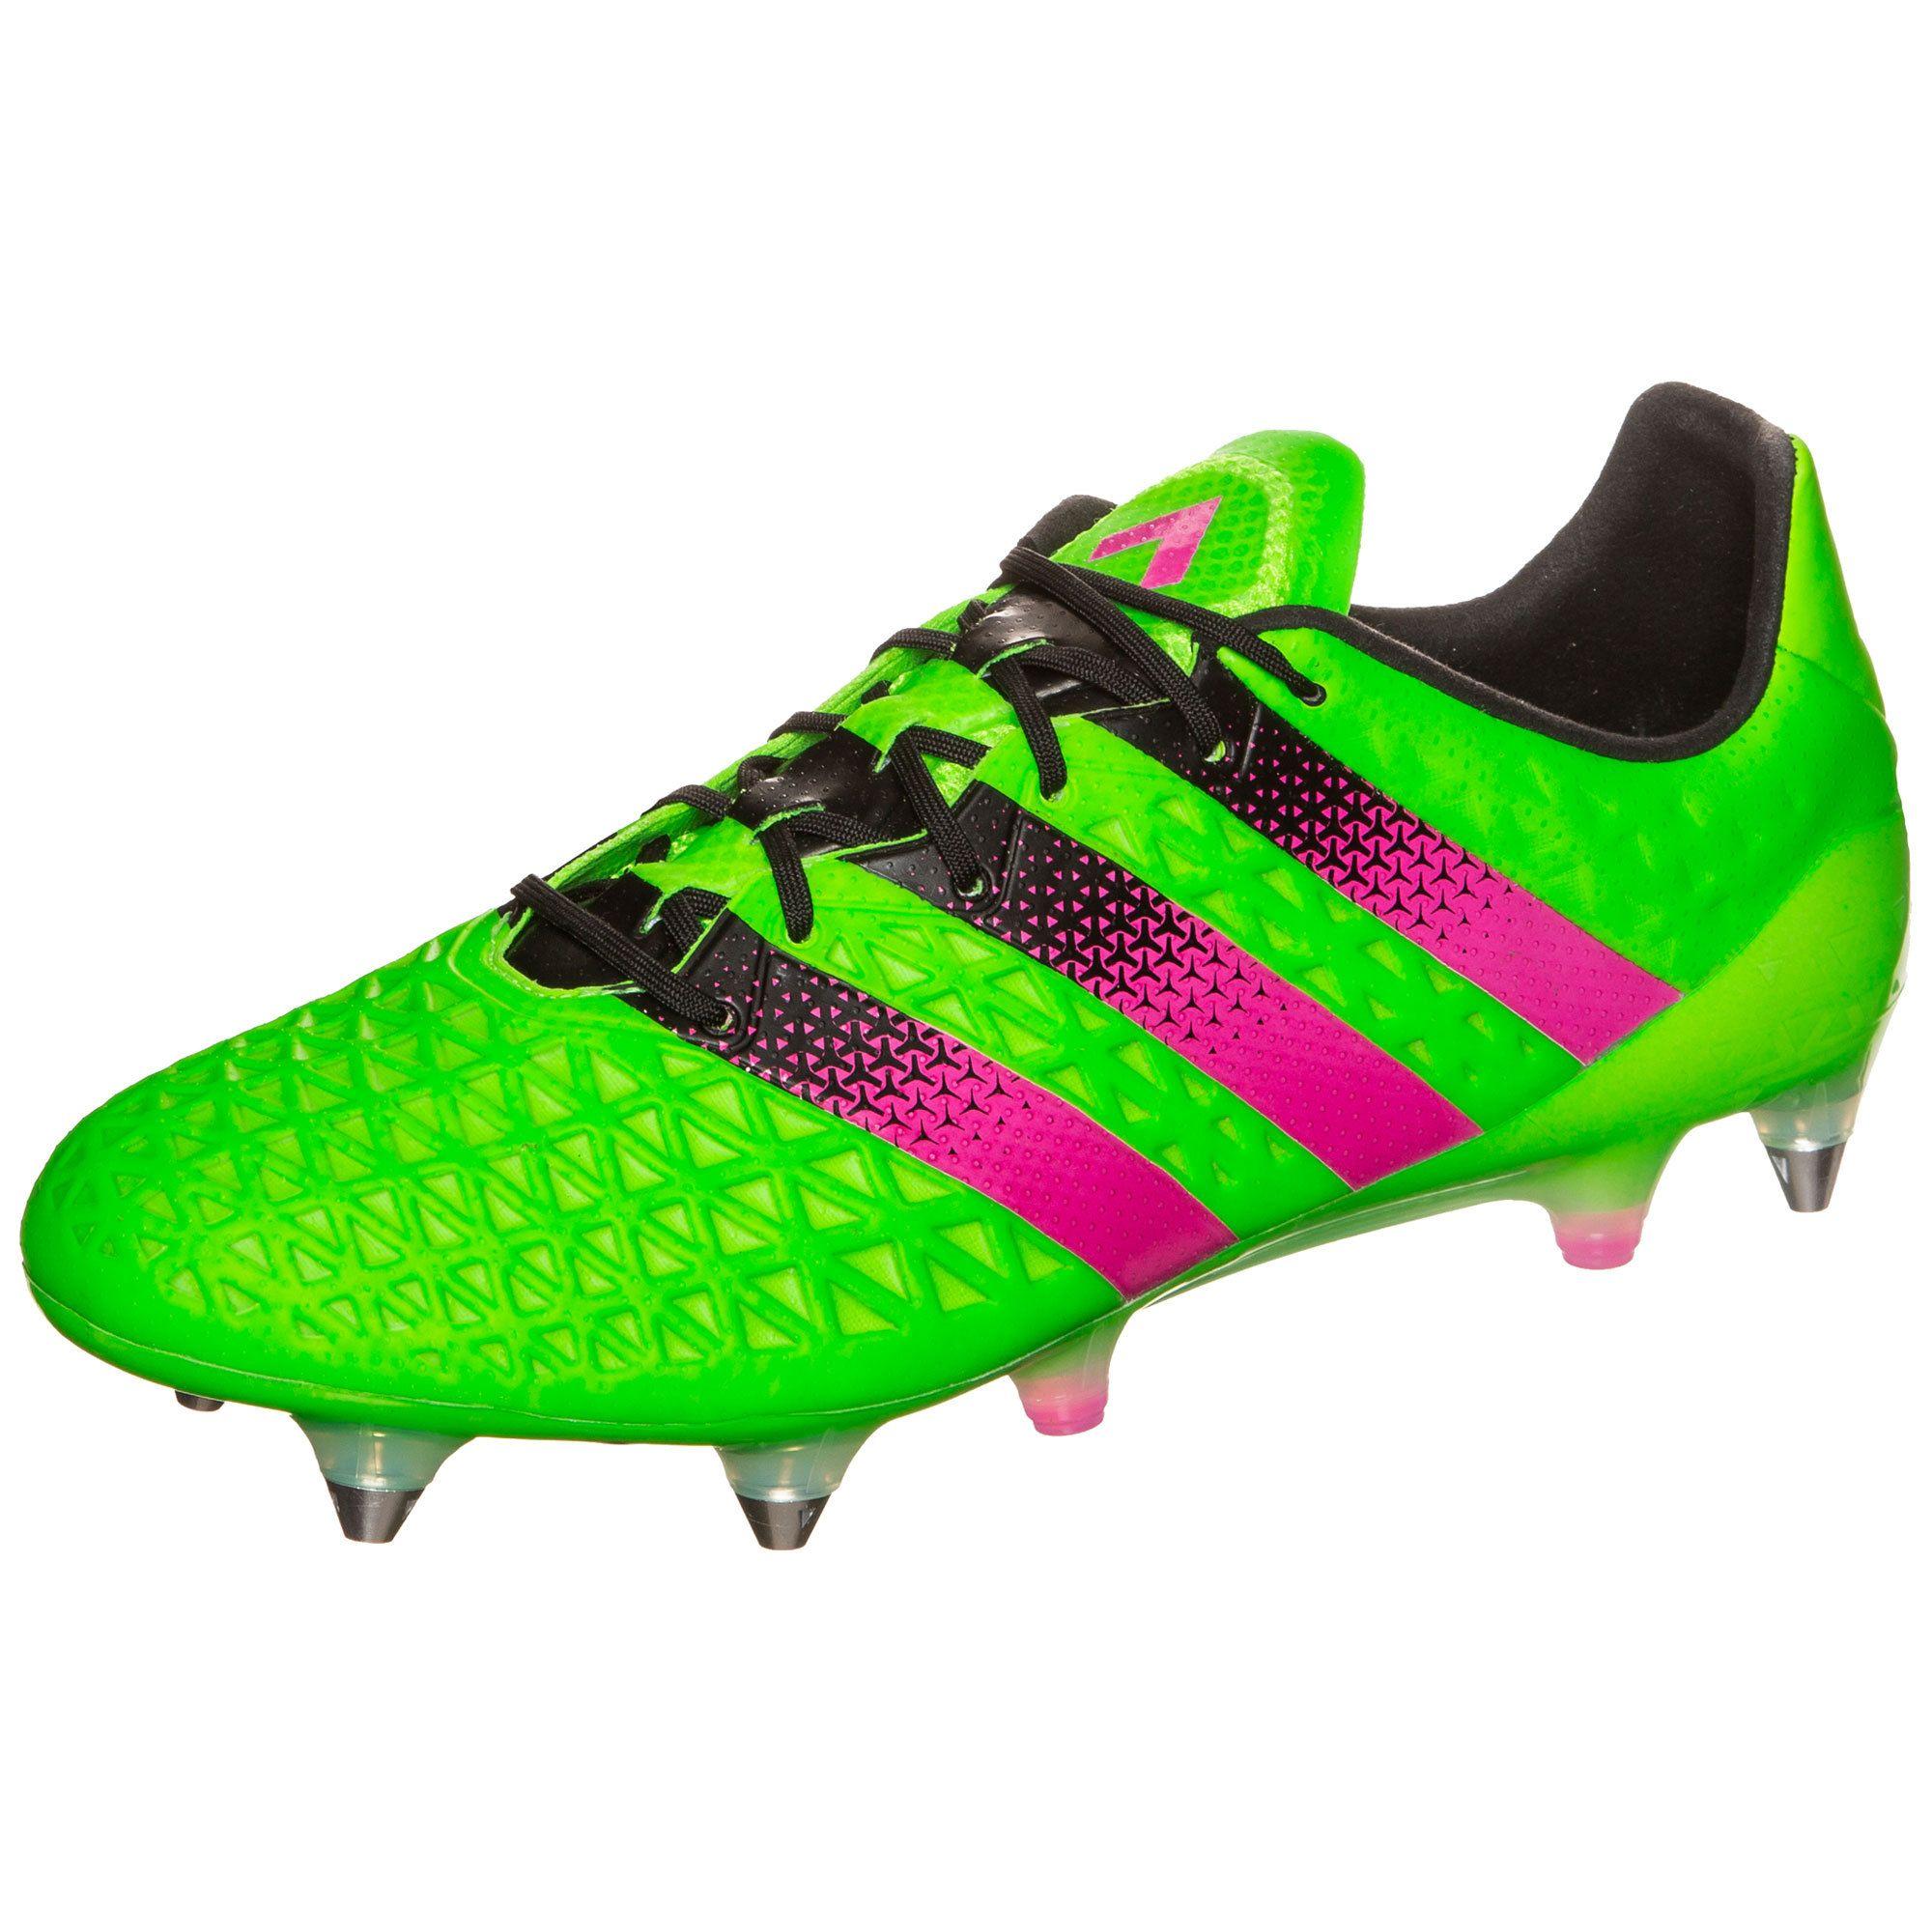 ADIDAS PERFORMANCE adidas Performance ACE 16.1 SG Fußballschuh Herren